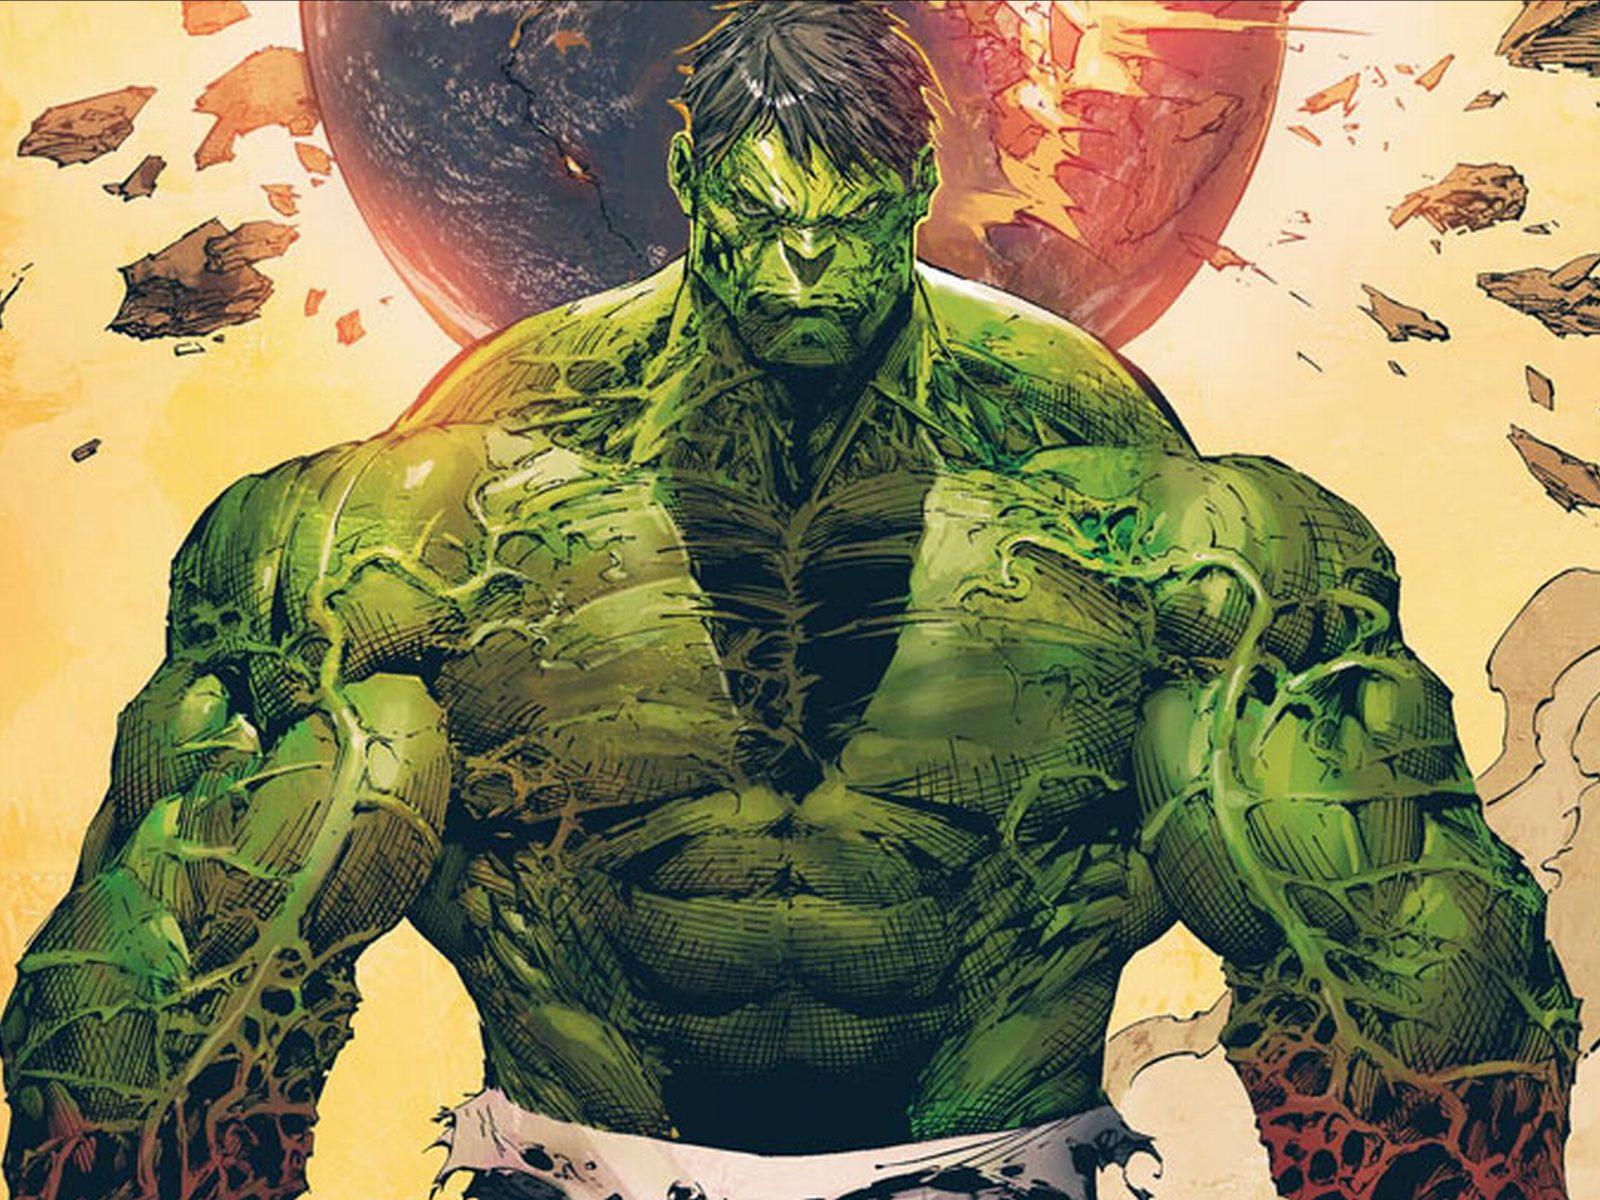 Motivational Wallpapers Iphone X Hulk Marvel 4k Uhd Wallpaper